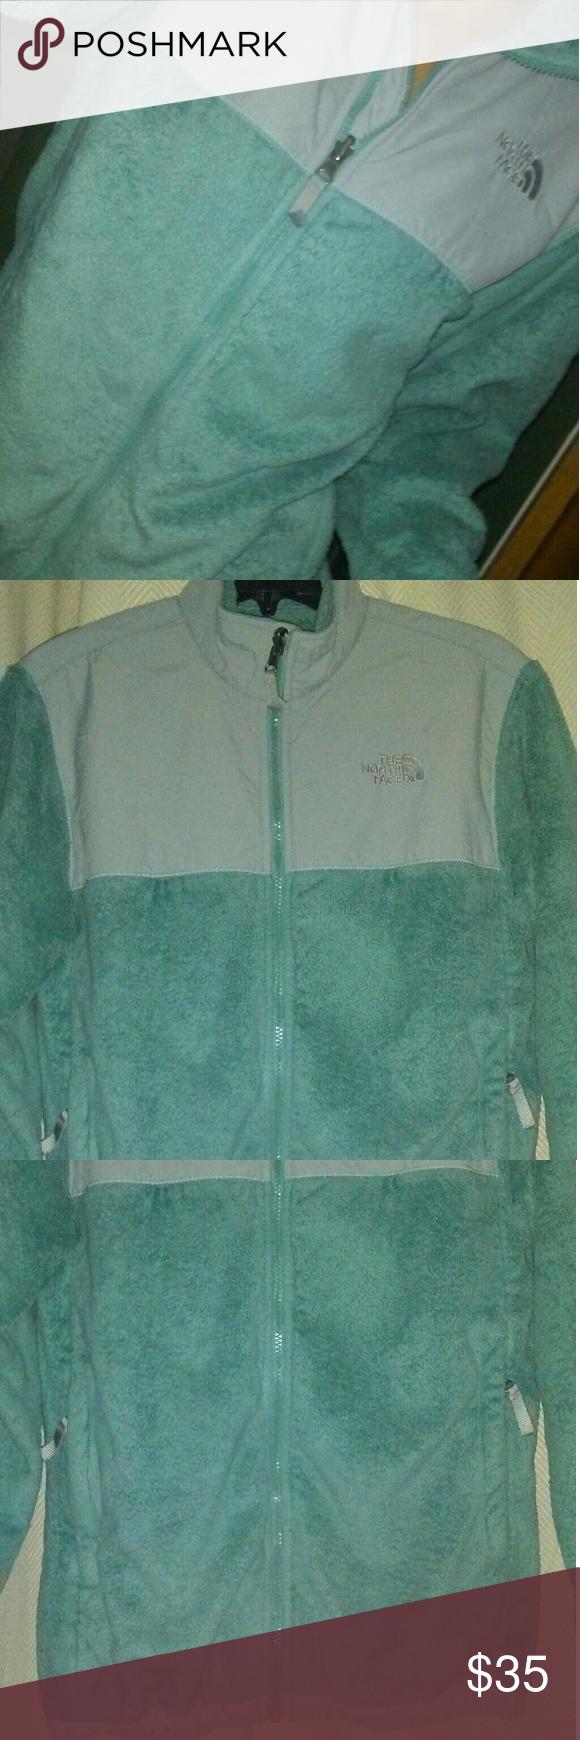 North face fleece jacket fuzzy teal and grey north face fleece